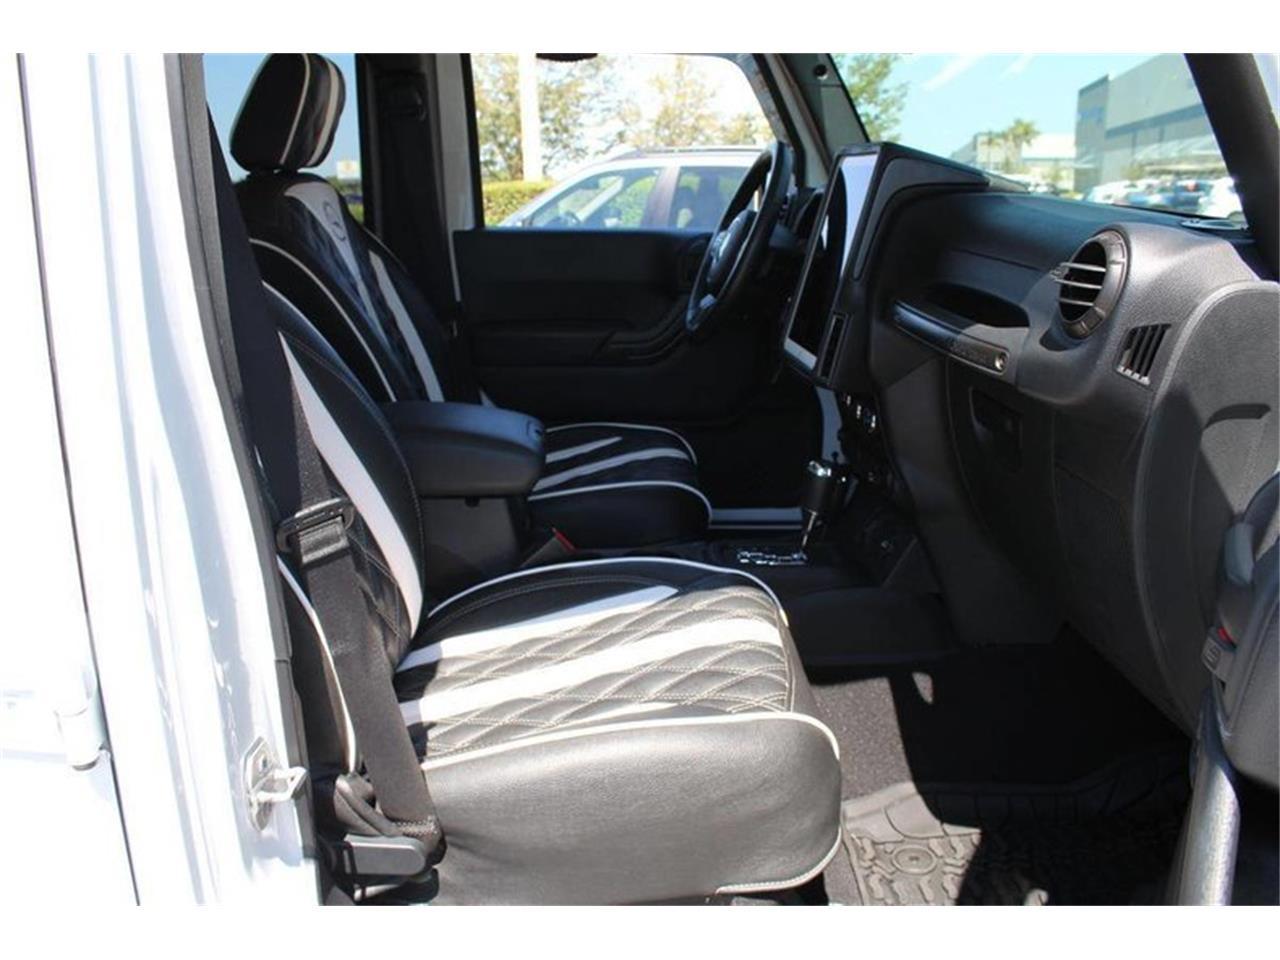 2016 Jeep Wrangler (CC-1164272) for sale in Sarasota, Florida